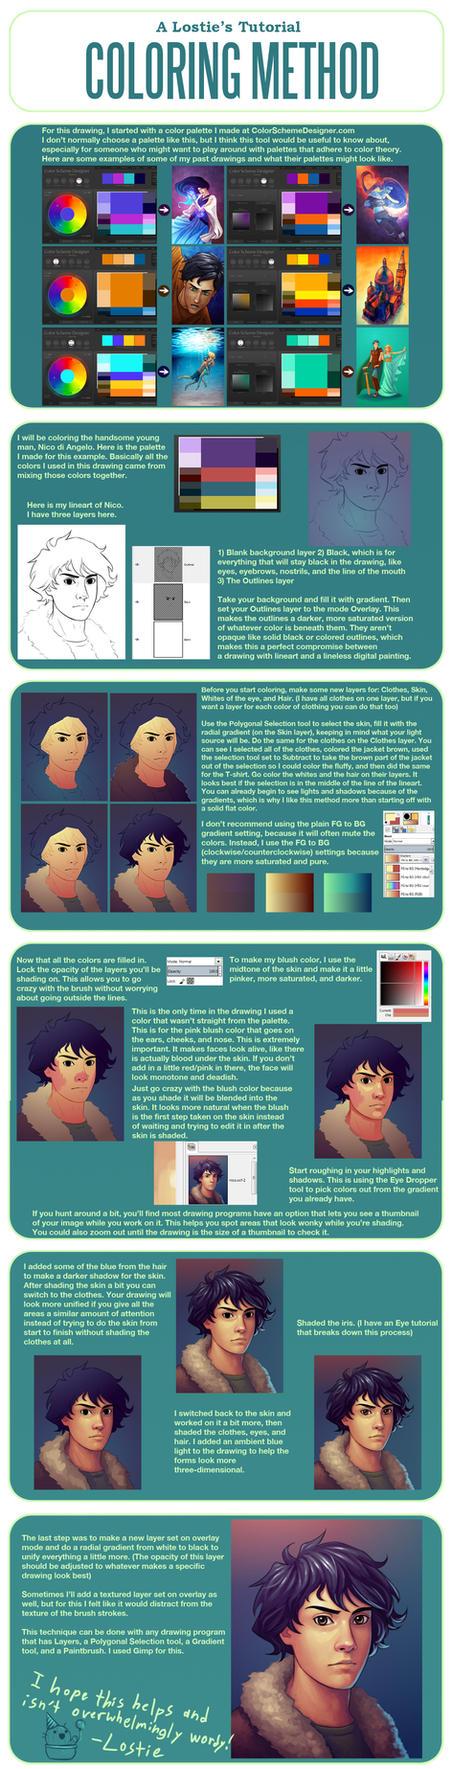 A Lostie's Tutorial - Coloring Method by lostie815